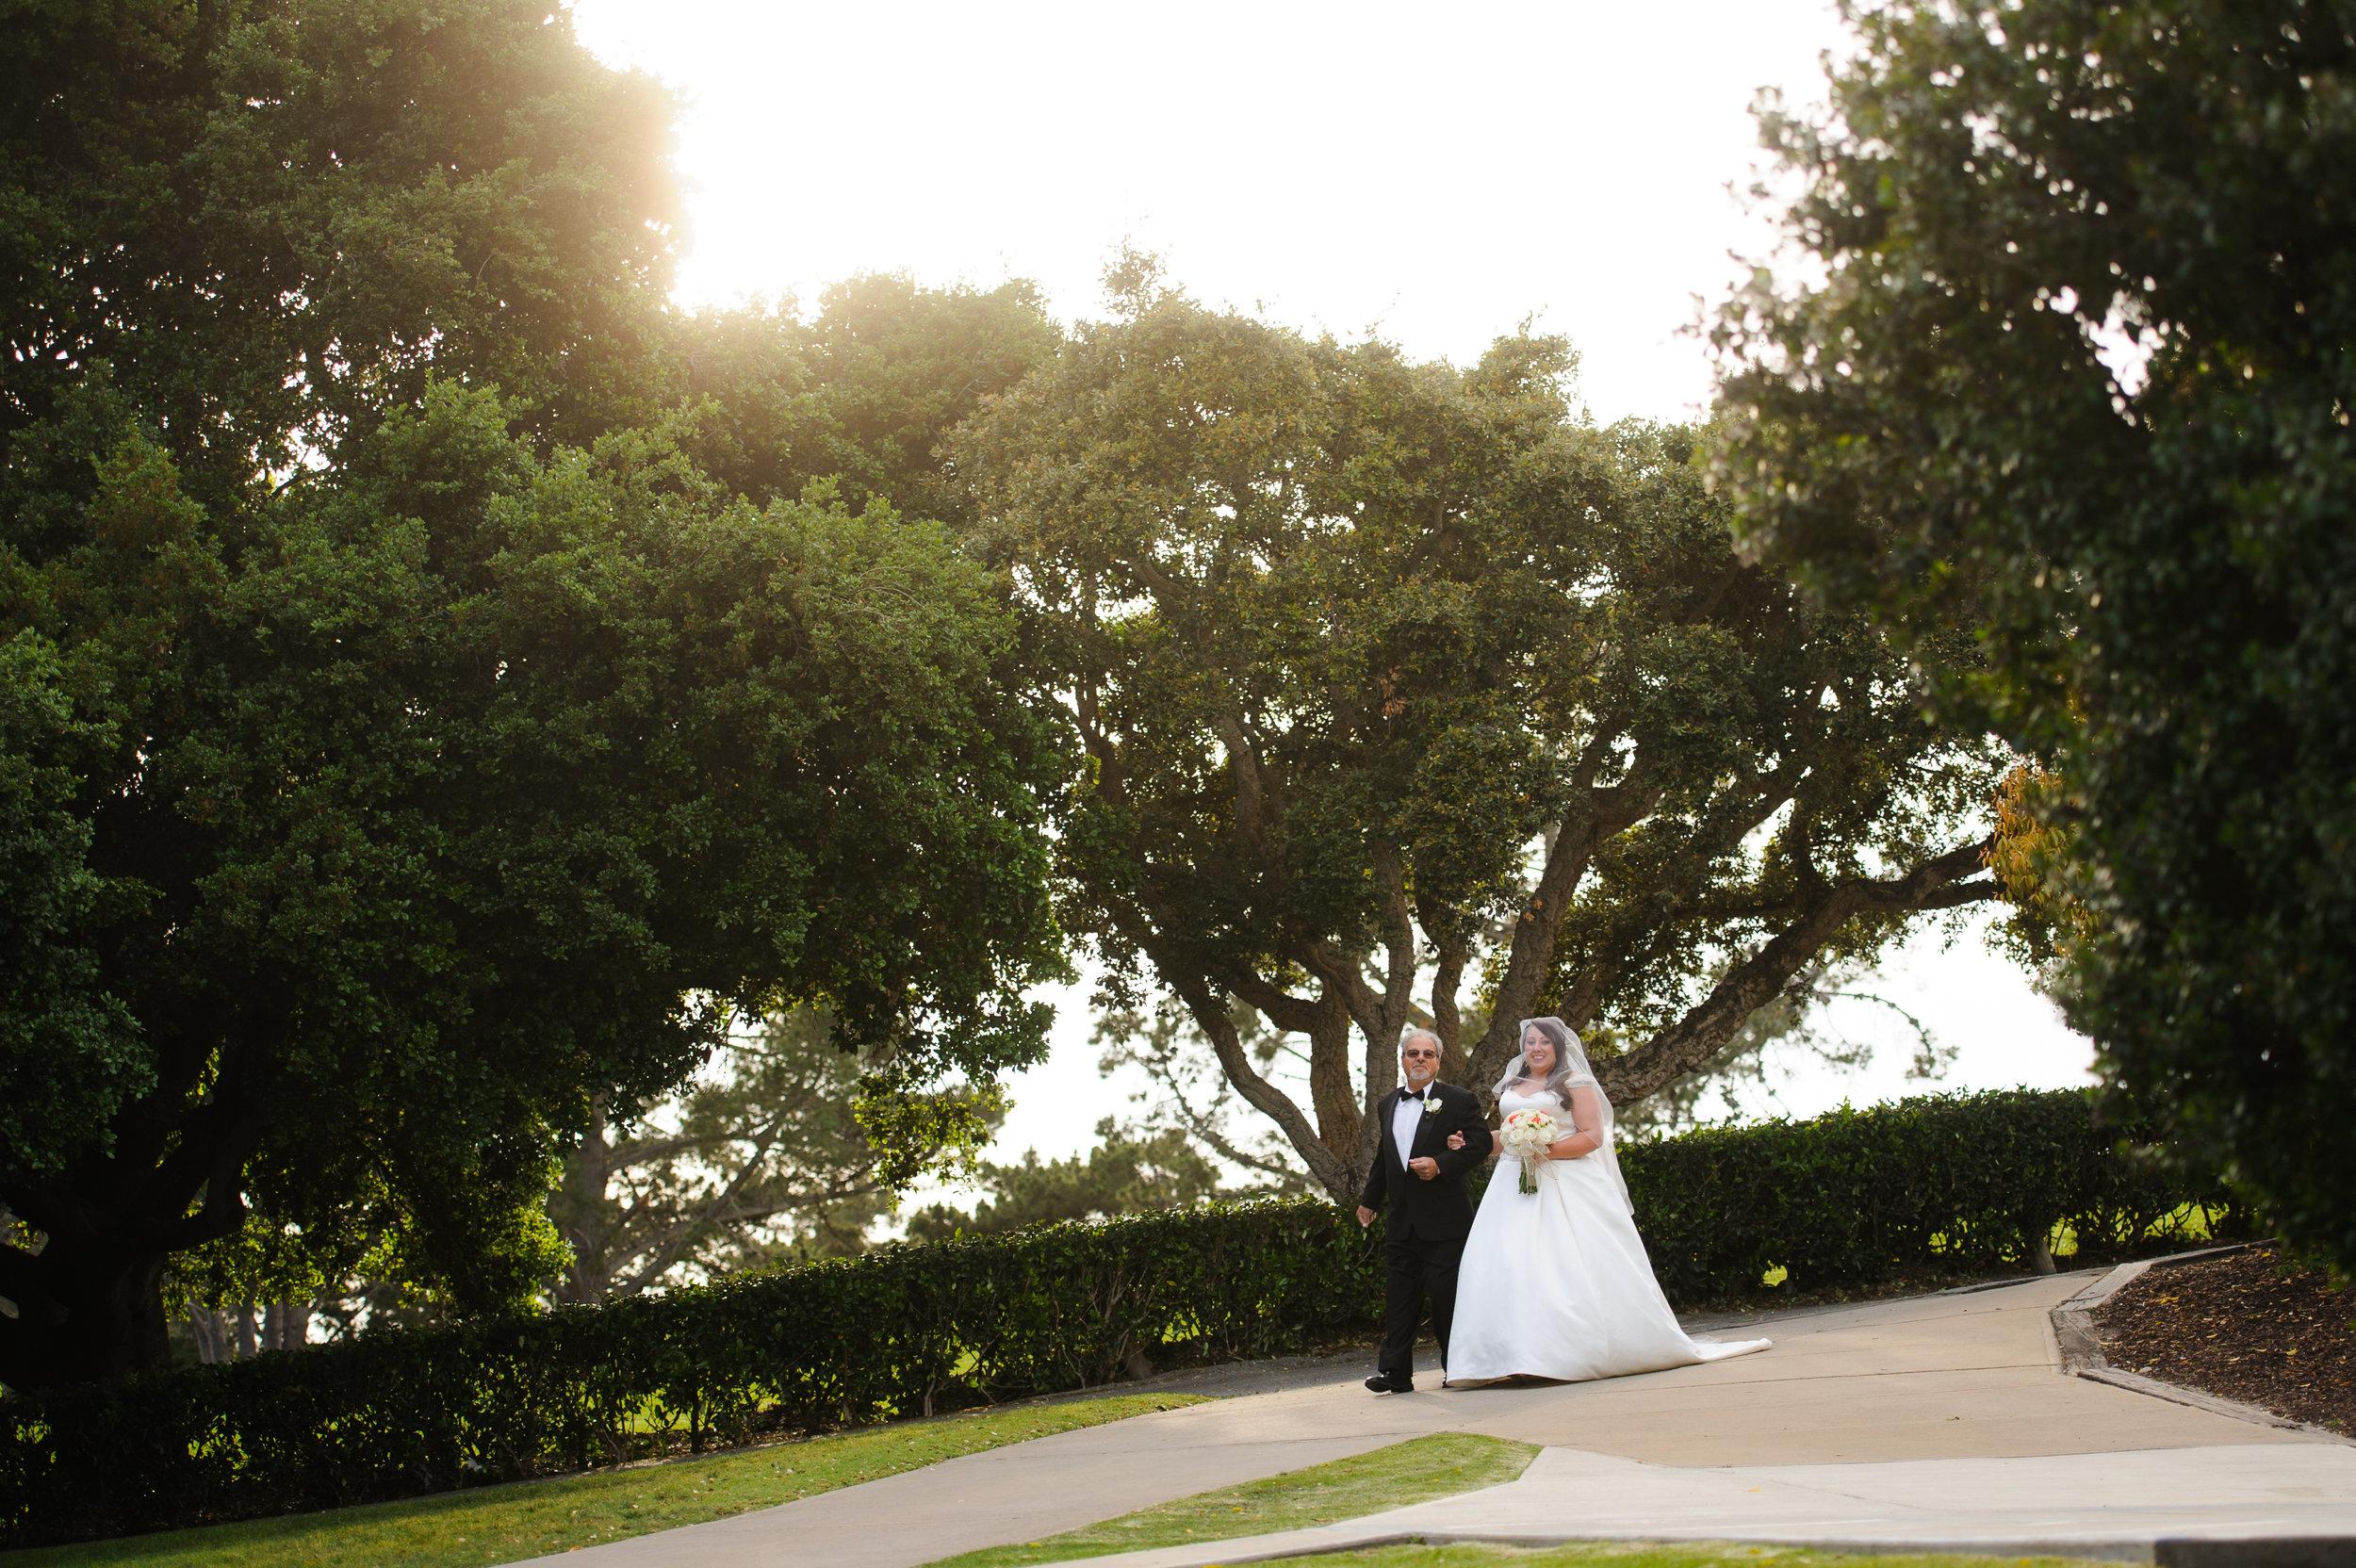 lauren-joel-001-rancho-canada-golf-course-carmel-wedding-photographer-katherine-nicole-photography009.JPG